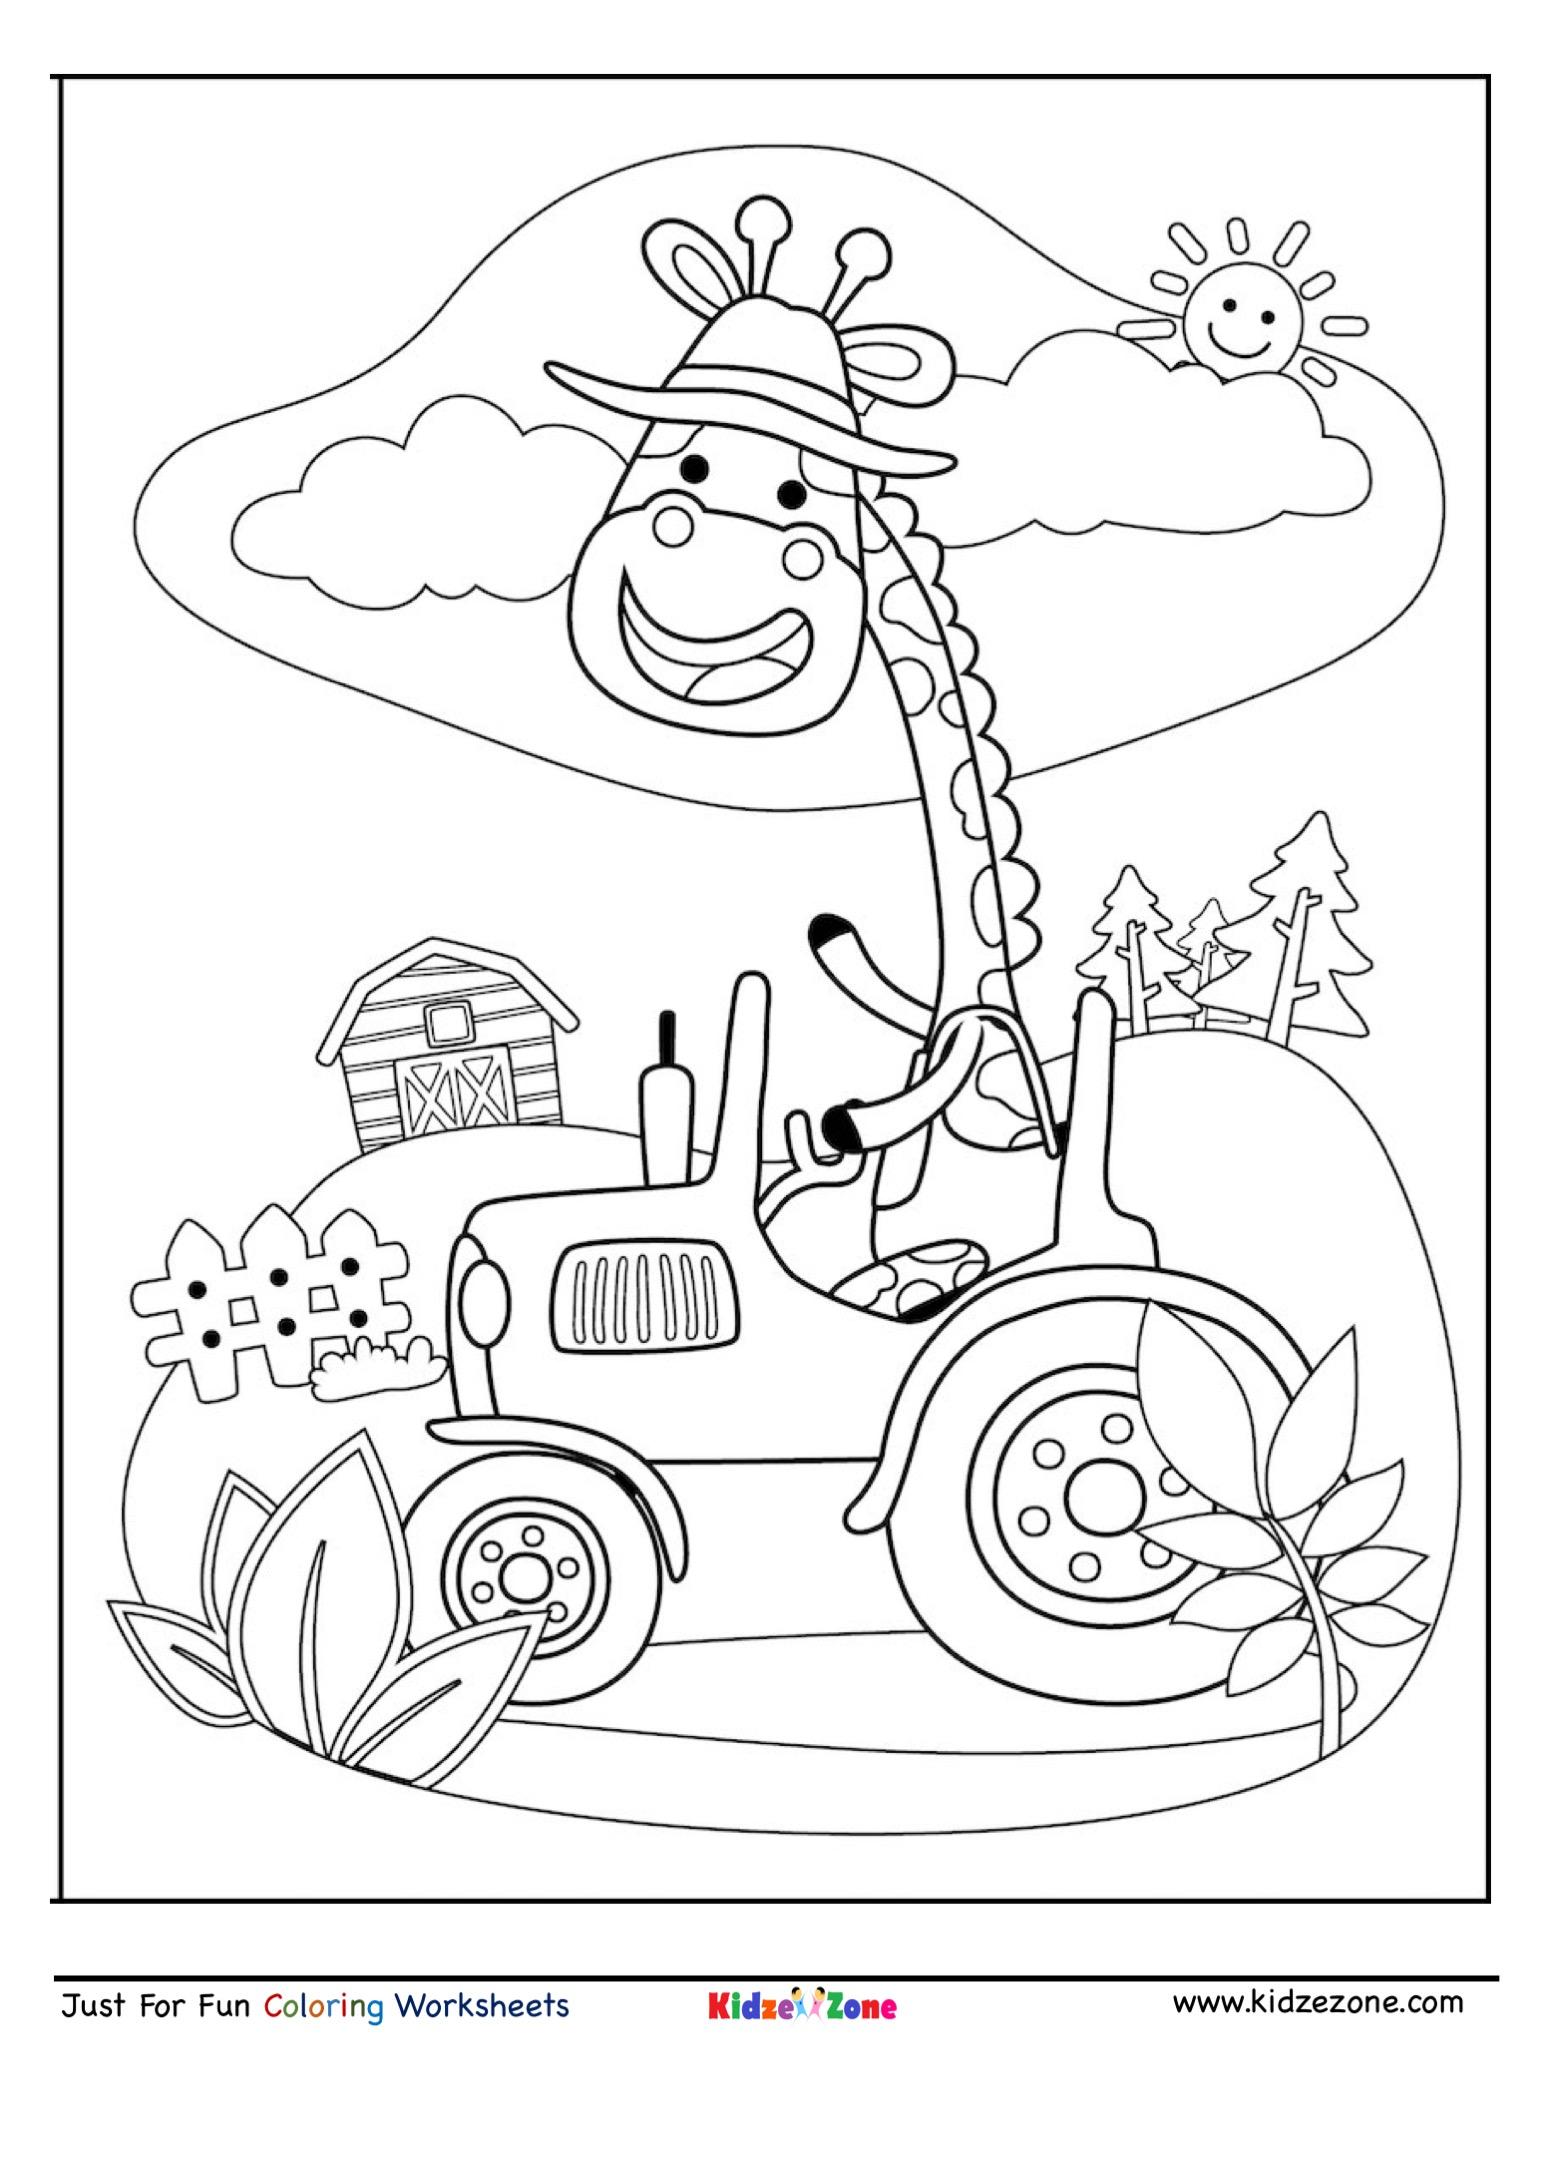 Giraffe Driving Cartoon Coloring Page